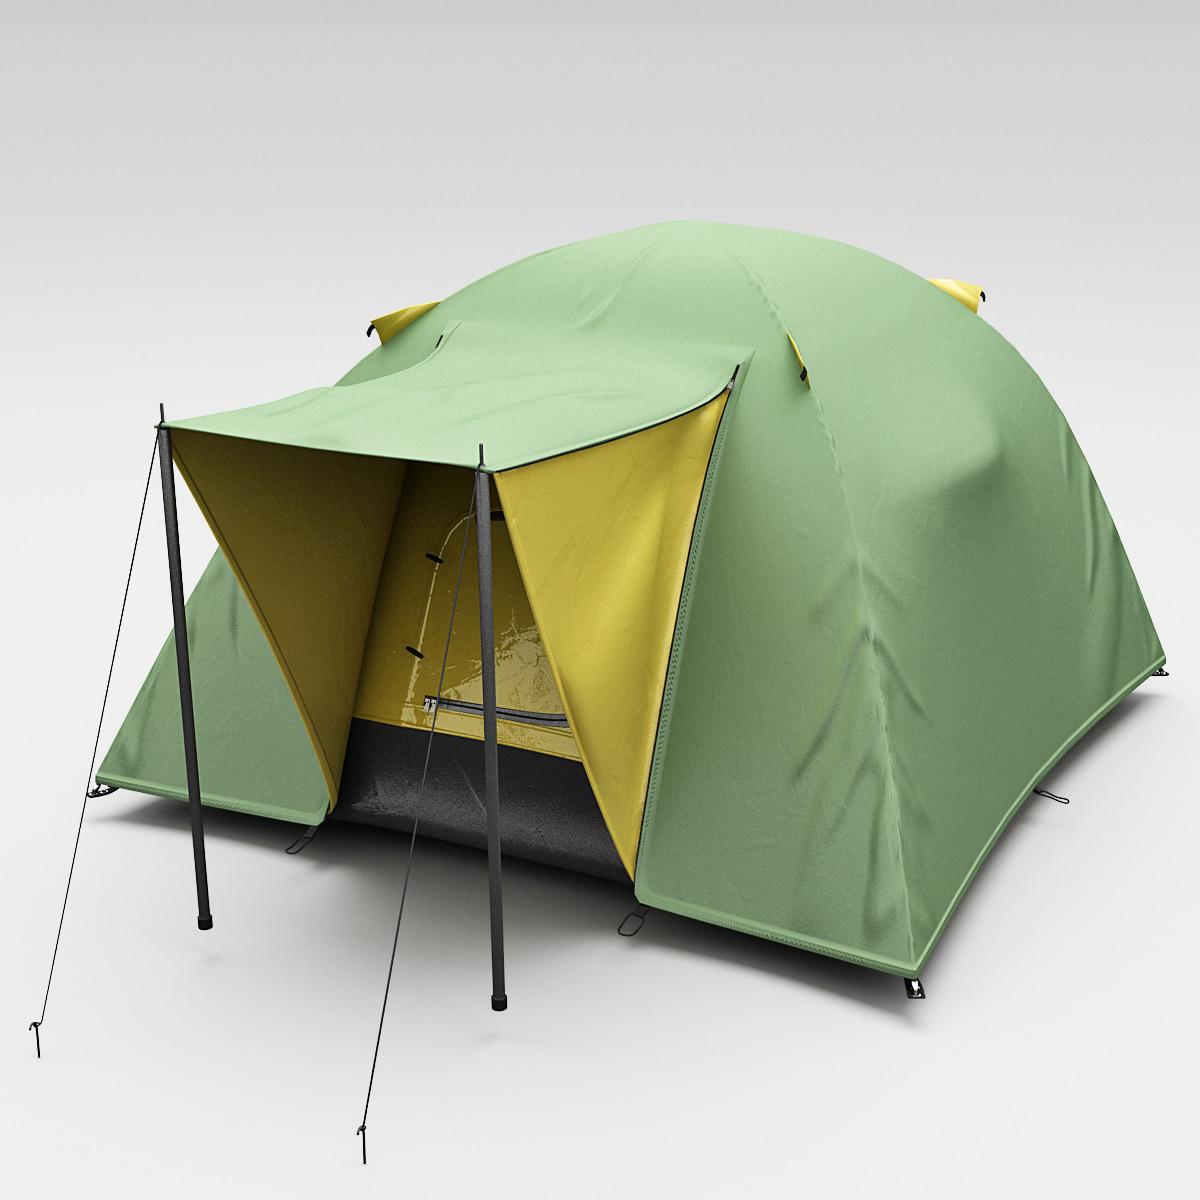 Outwell_Tent_Nevada_3_0000.jpg